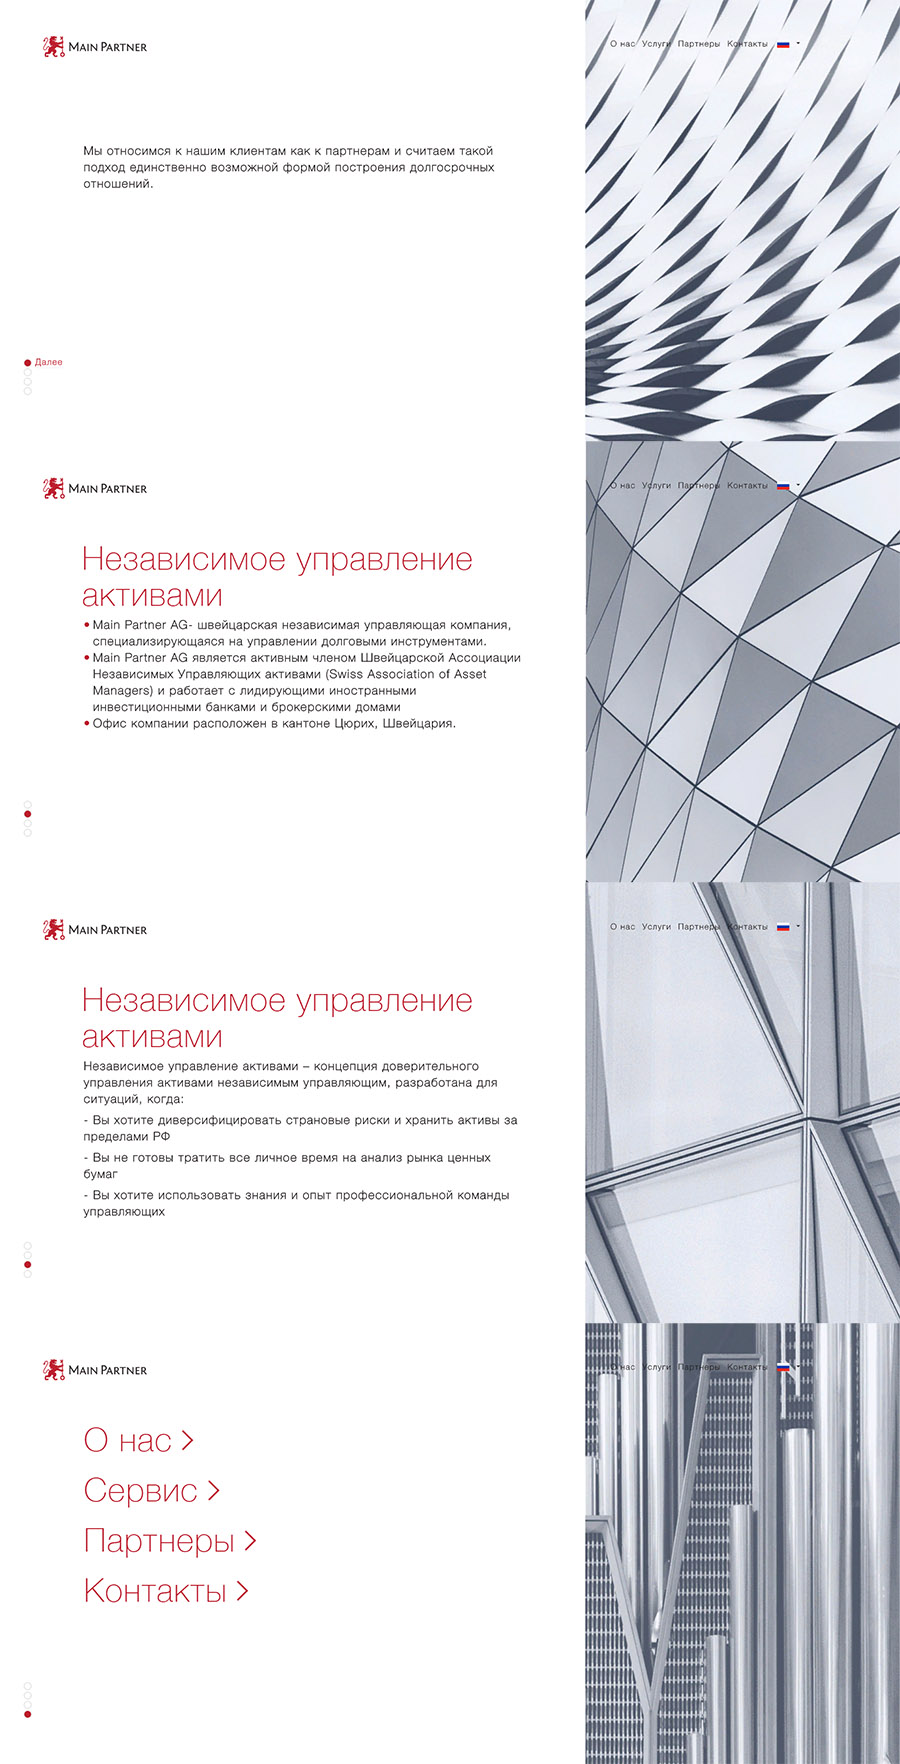 Корпоративный сайт для Швейцарской компании MainPartner